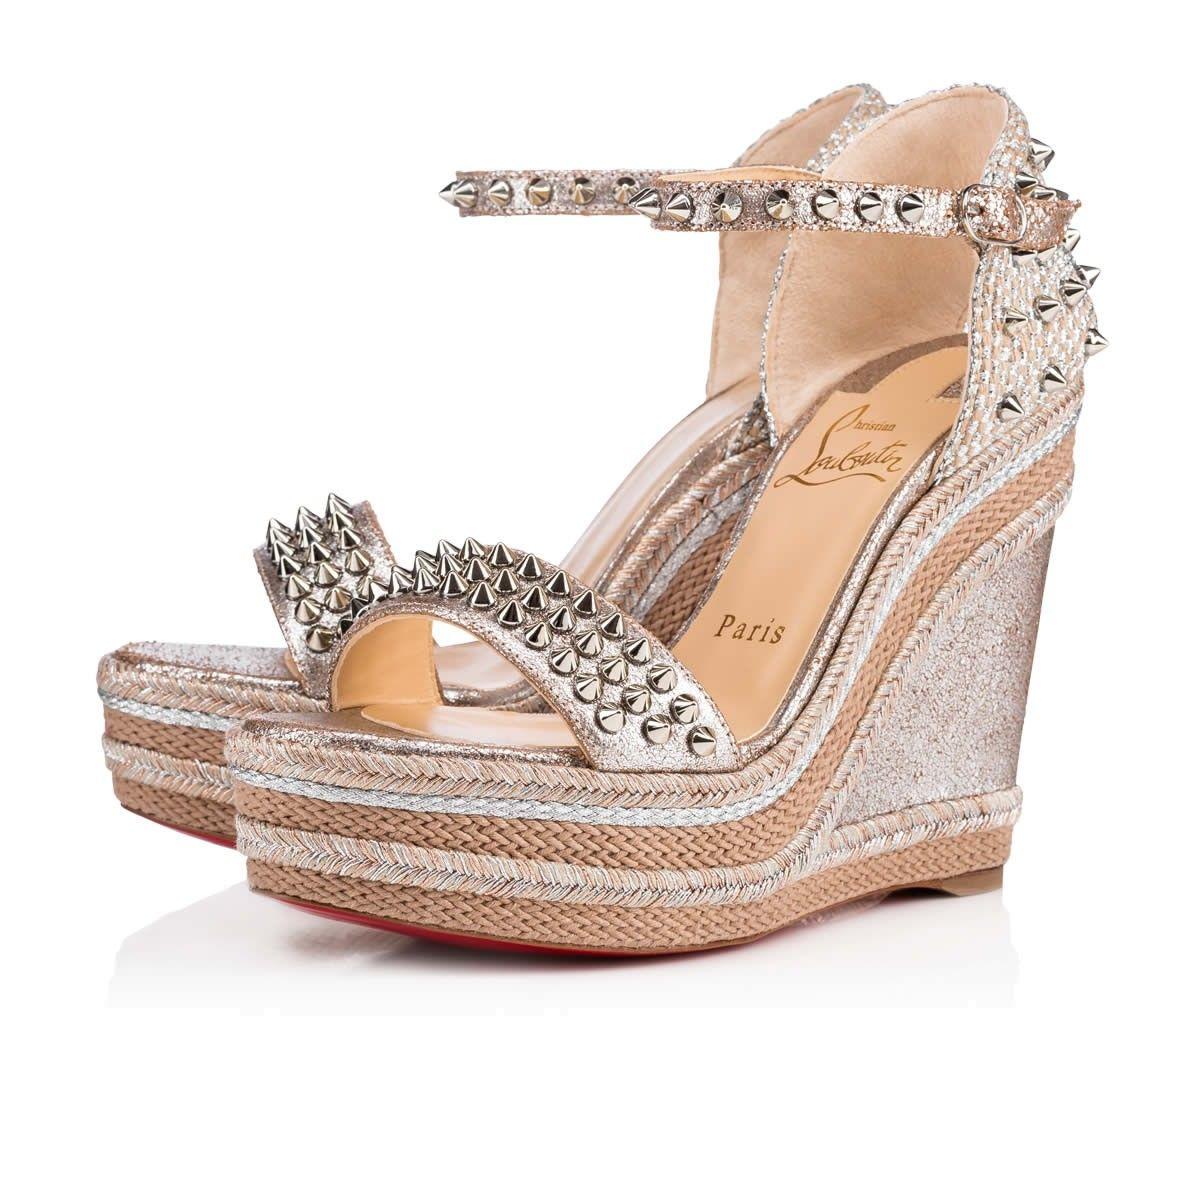 prix compétitif 80f4a b35e2 CHRISTIAN LOUBOUTIN Madmonica. #christianlouboutin #shoes ...